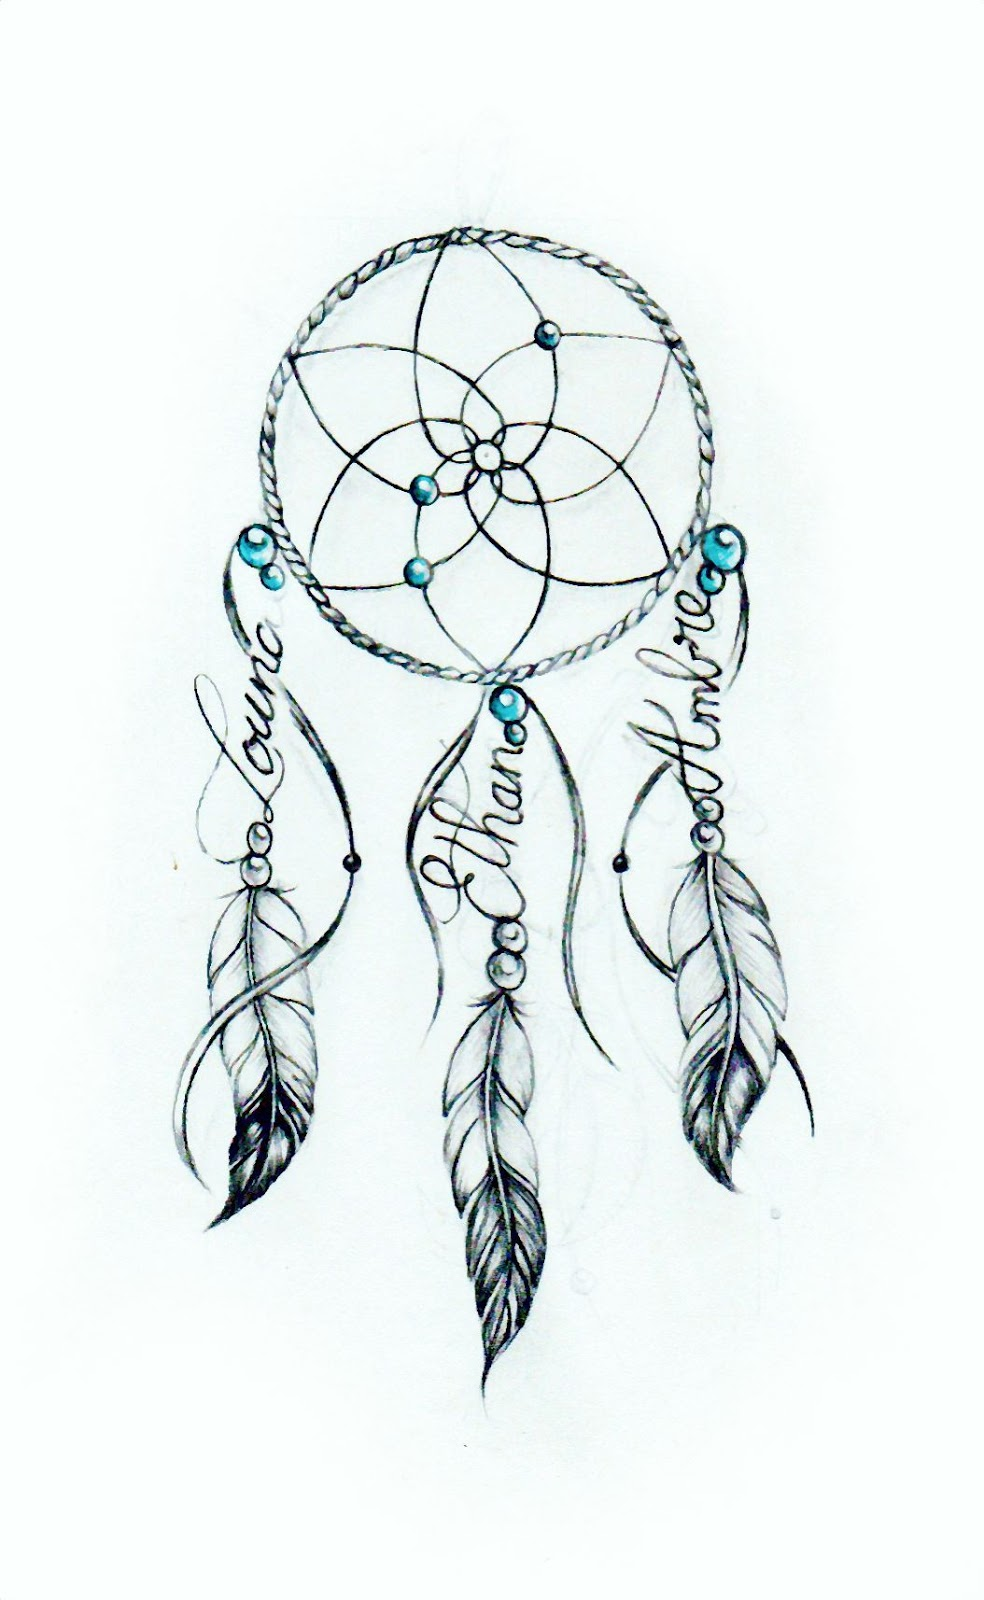 Virgo Zodiac Horoscope Tattoo Designs (101)